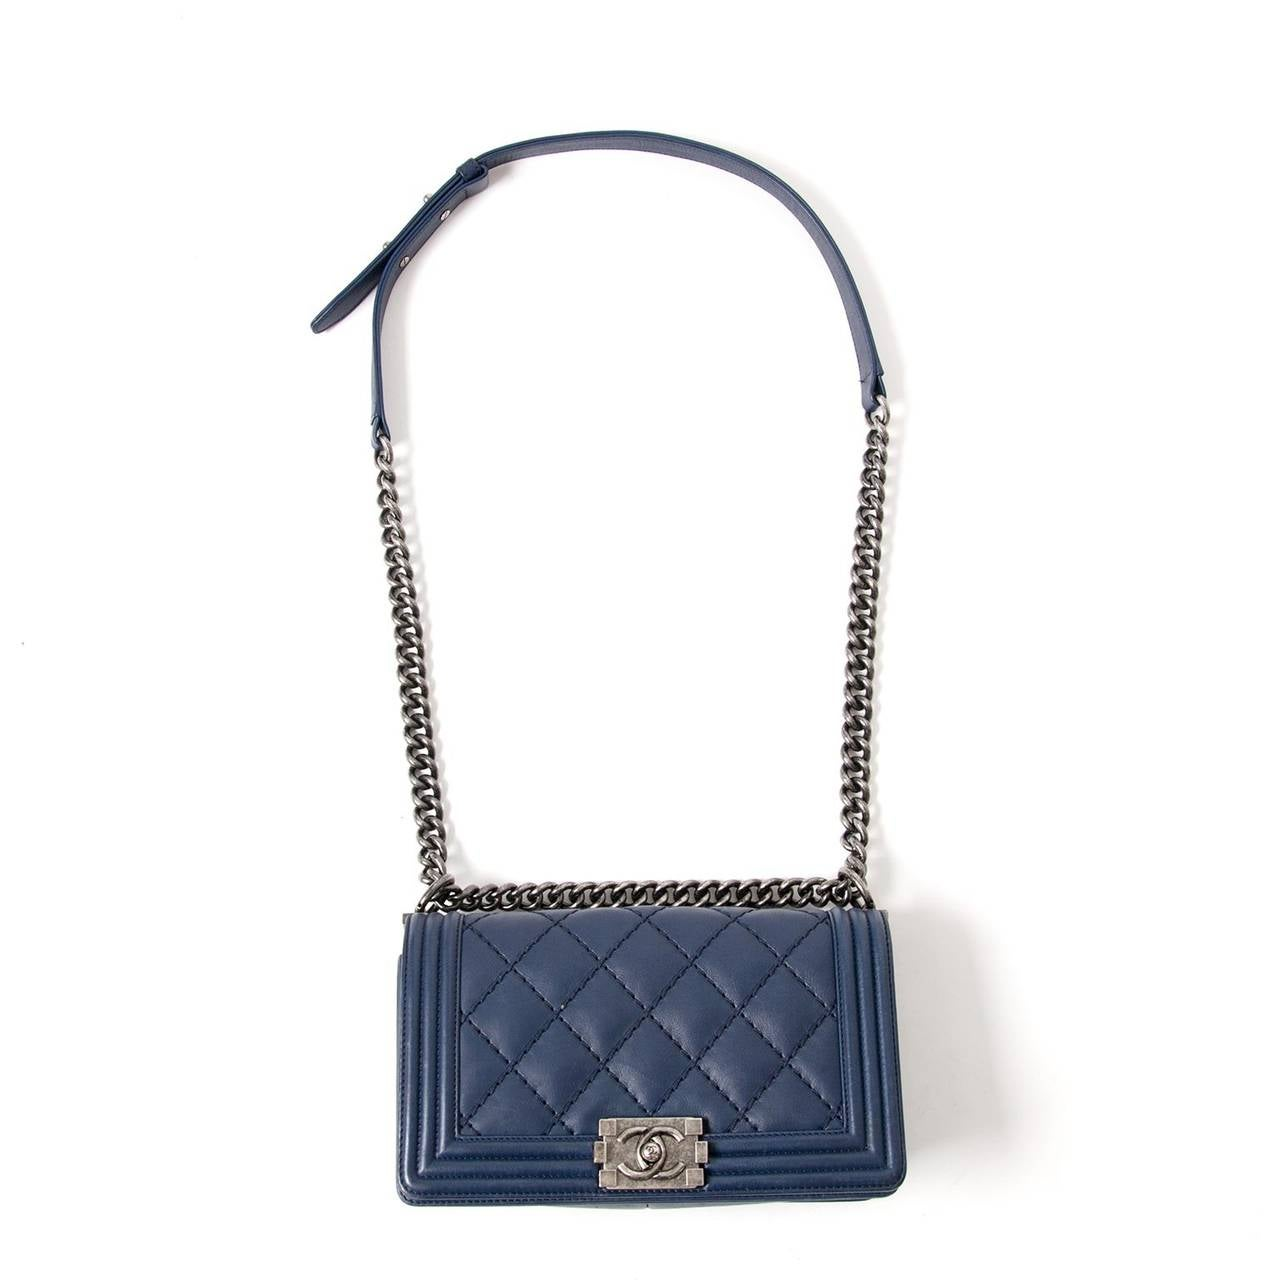 Chanel Lambskin Medium Quilted Boy Bag 6